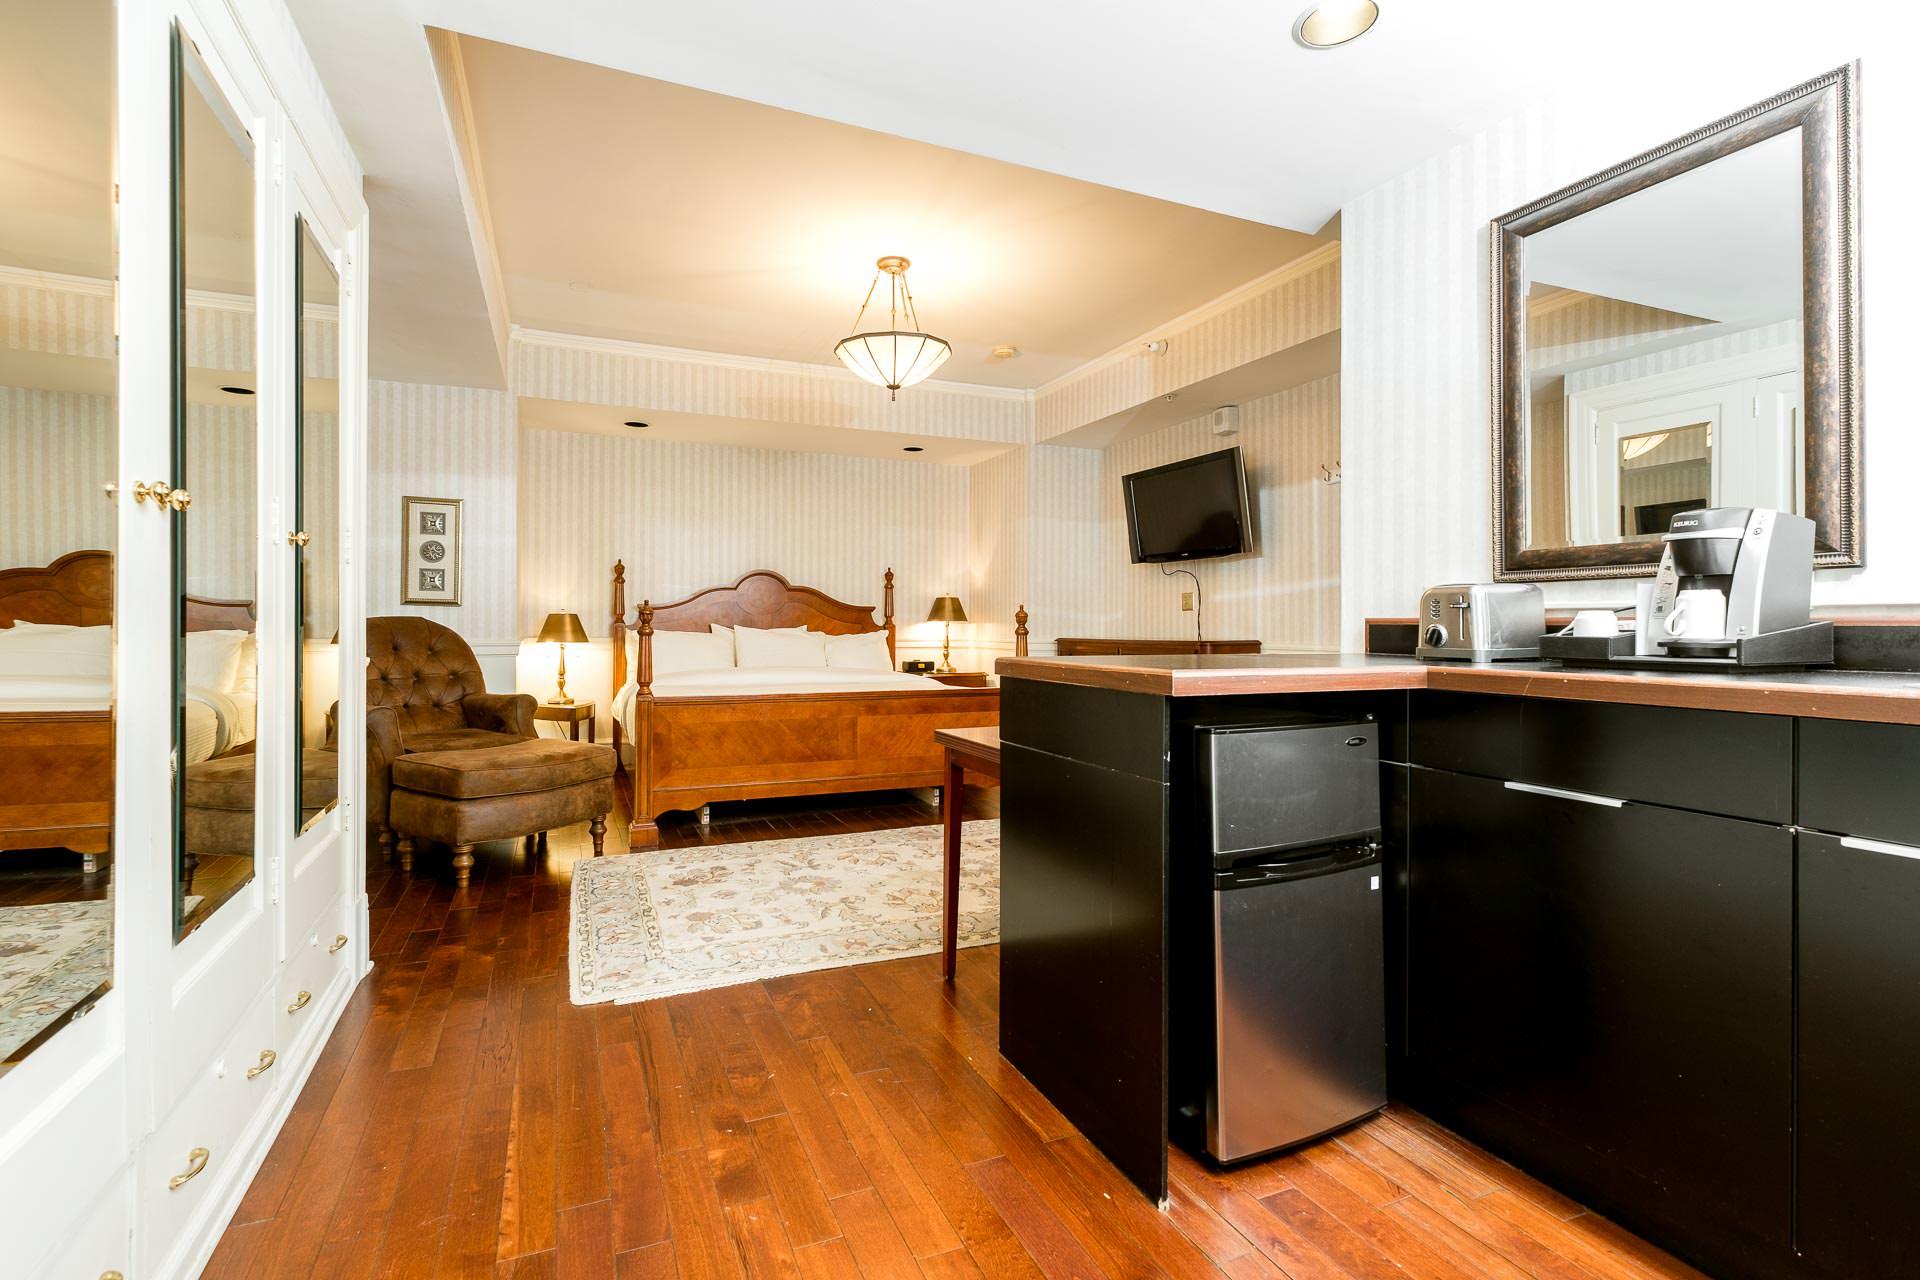 1119 Bedroom and kitchenette.jpg